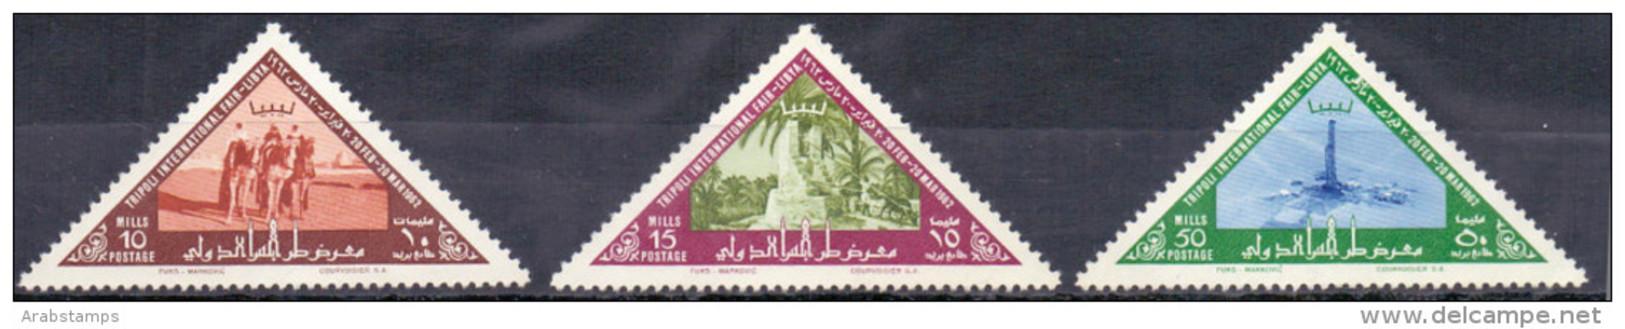 1962 Libya Tripoli International Fair Complete Set 3 Values MNH    (Or Best Offer) - Libyen